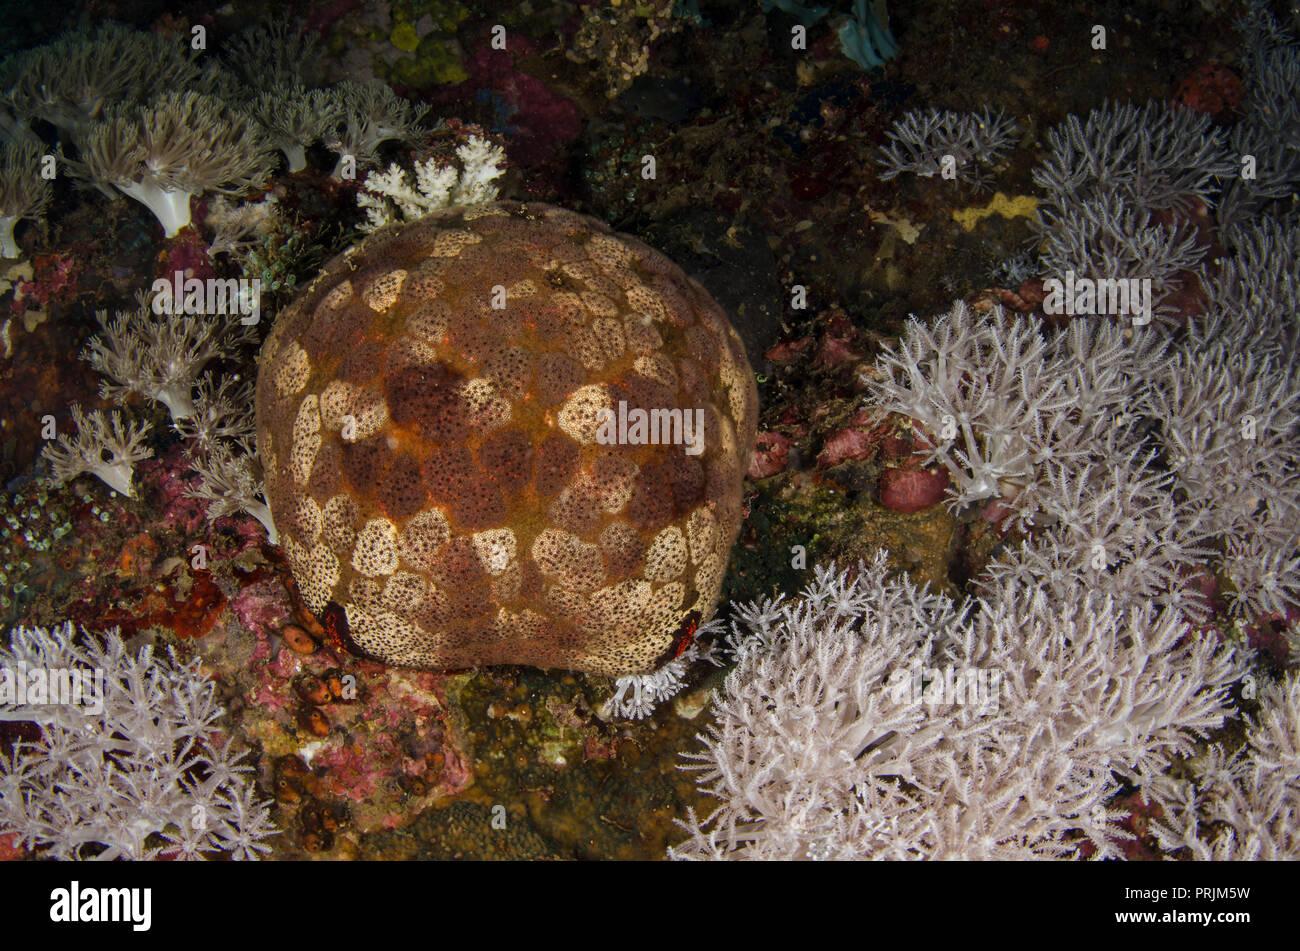 Cushion star, Culcita novaguineae, Oreasteridae, Anilao, Batangas, Philippines, Philippine Sea, Pacific Ocean, Asia - Stock Image